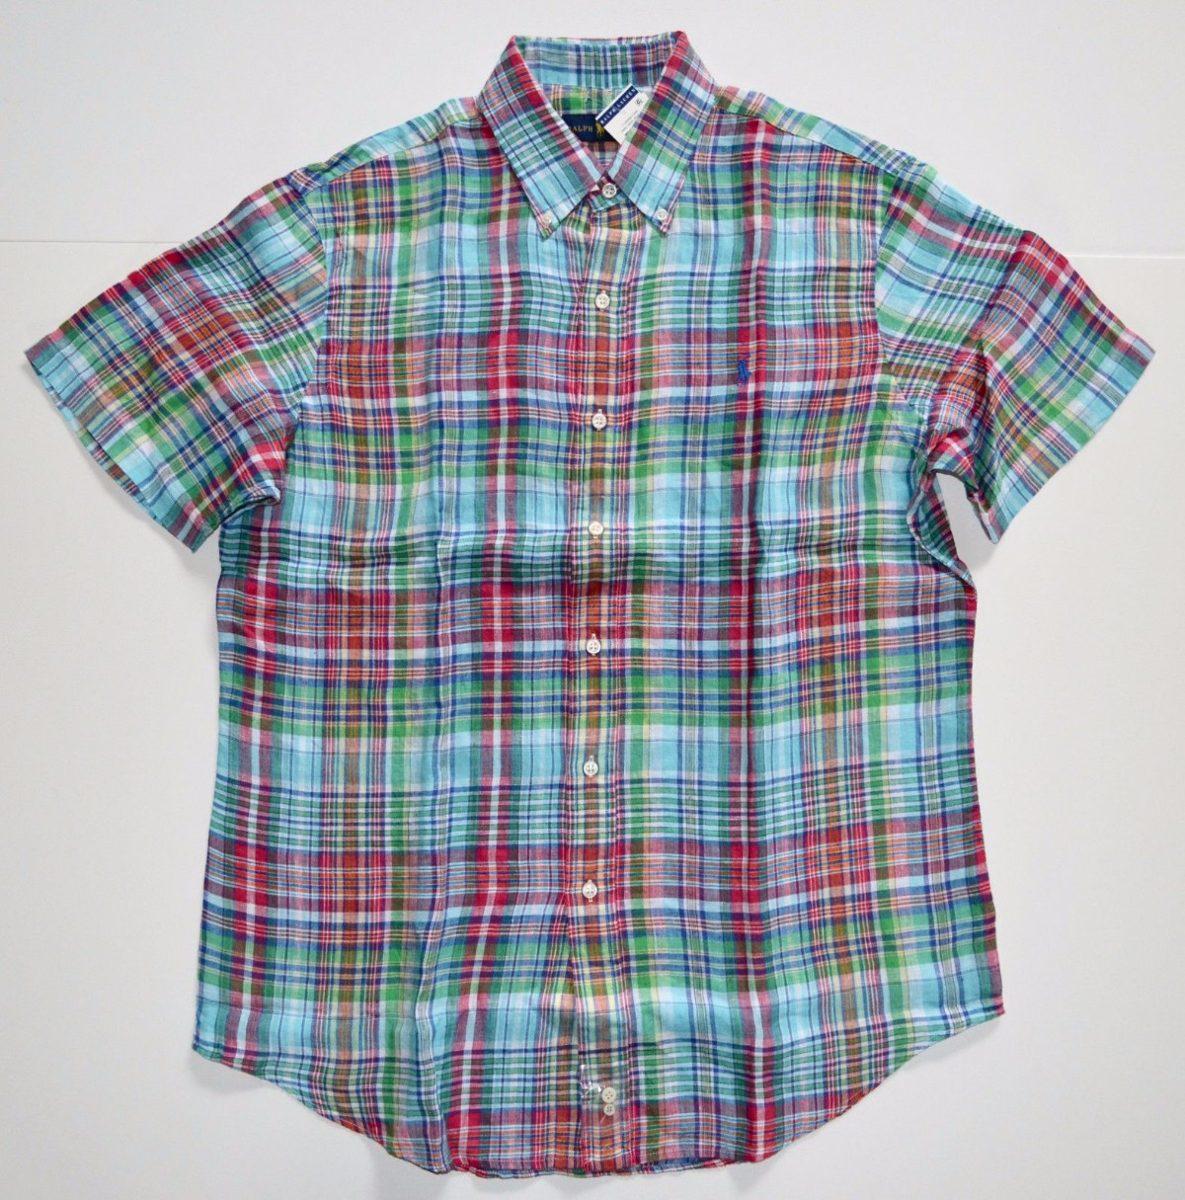 36012b5331a73 Camisa Social Polo Ralph Lauren Tamanho P S Manga Curta Nova - R ...